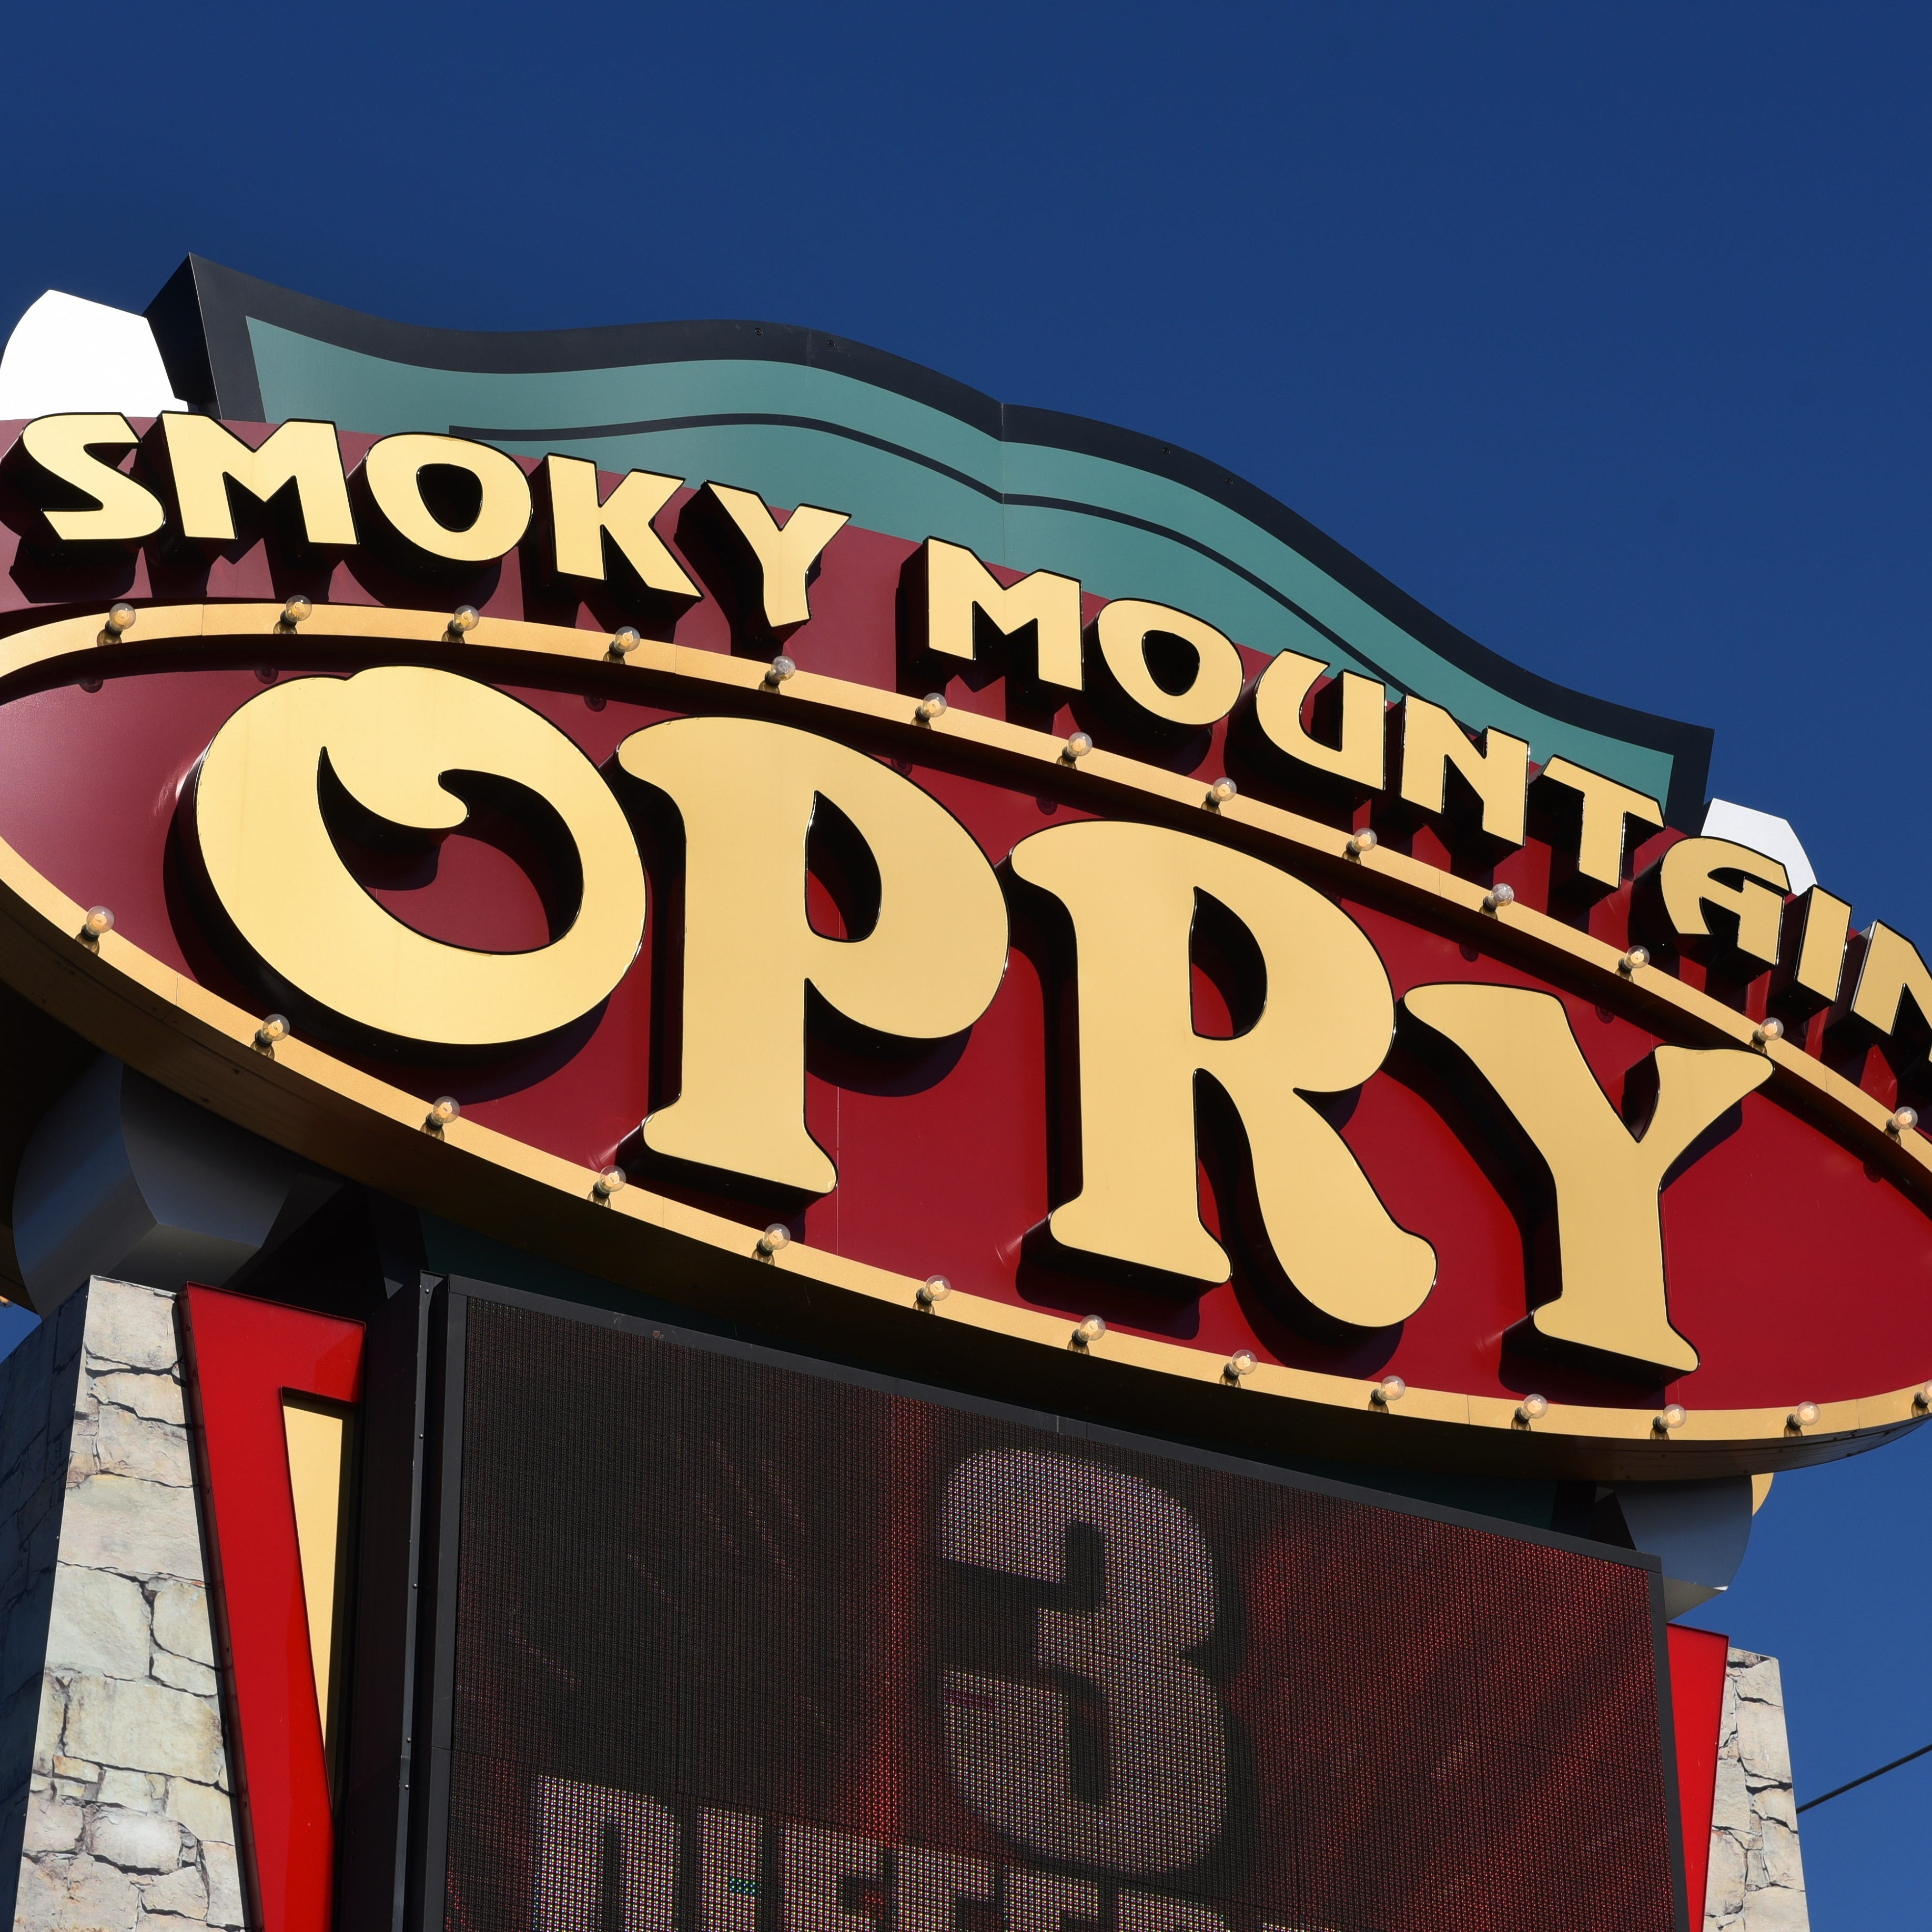 Dolly Parton's dinner show company buys Smoky Mountain Opry, Comedy Barn, Hatfield & McCoy